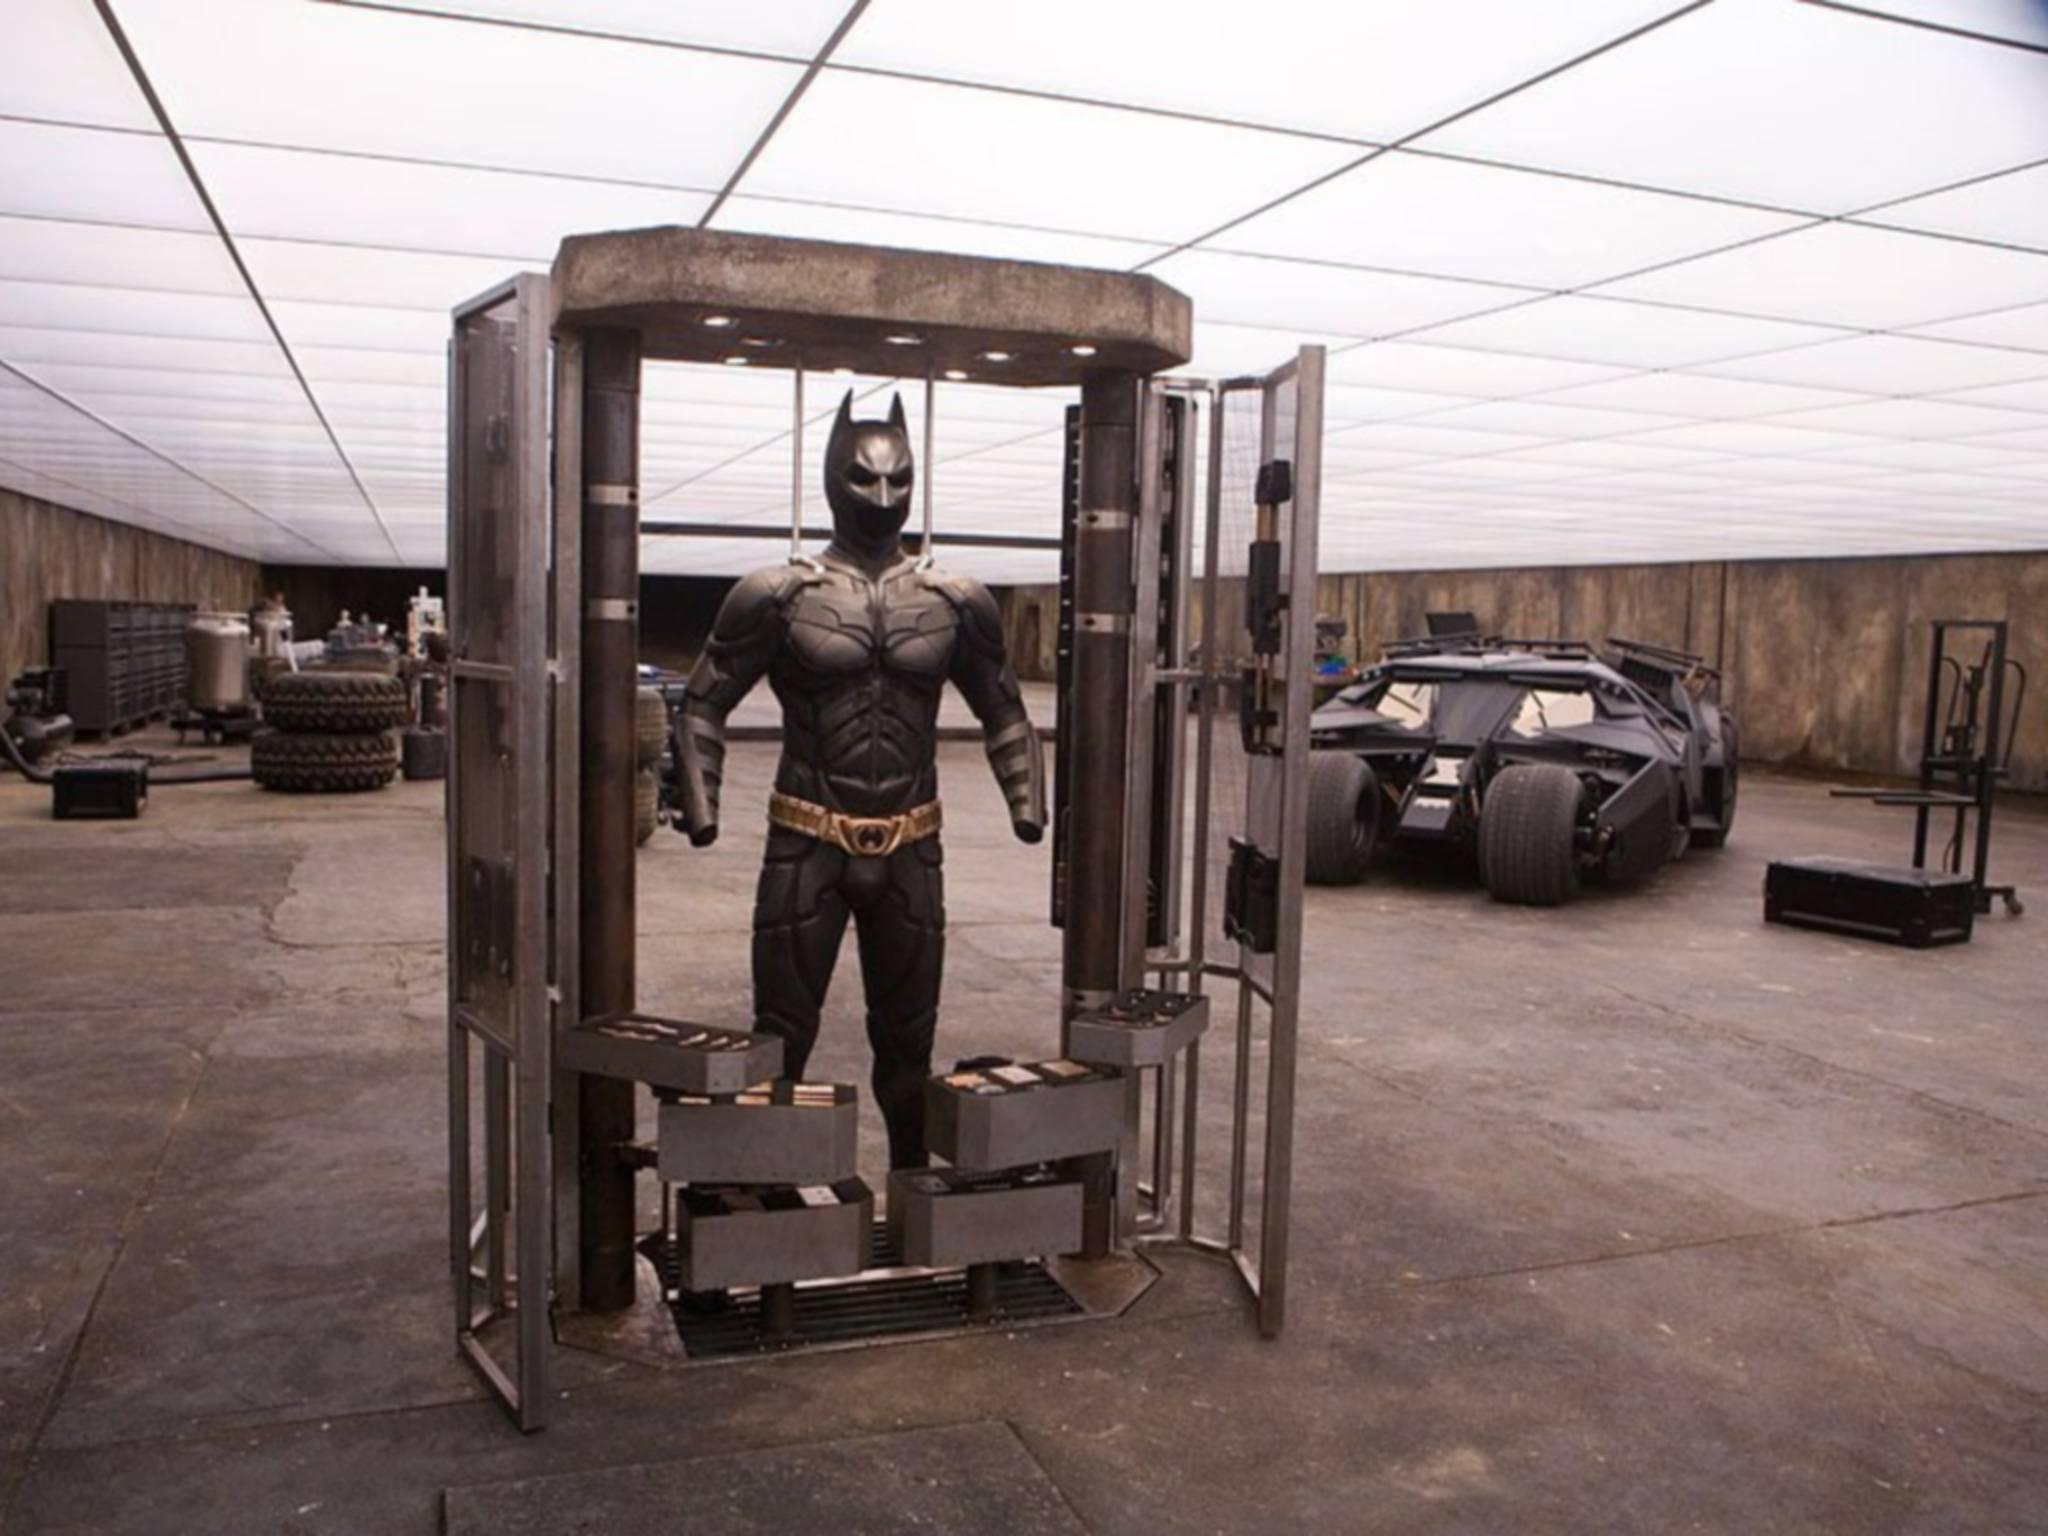 Wenn jemand coole Gadgets hat, dann ja wohl Batman.